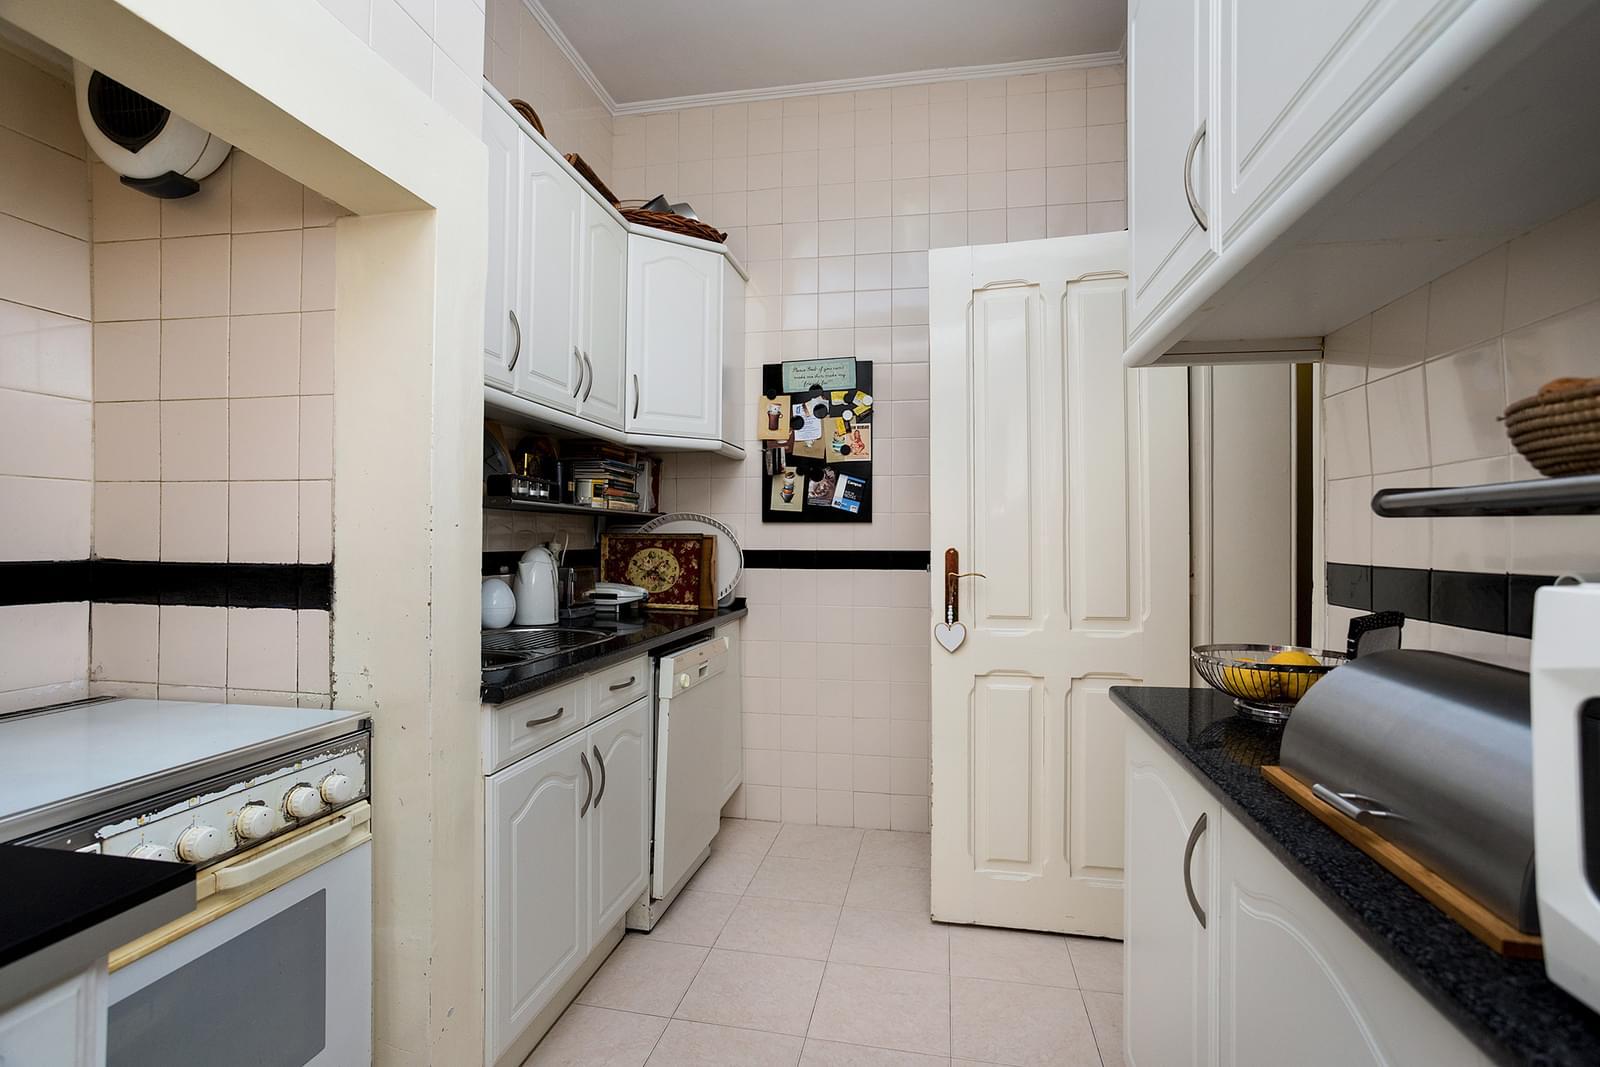 pf17379-apartamento-t3-lisboa-002efe4a-d5c7-4b09-9987-58e70f9e766f